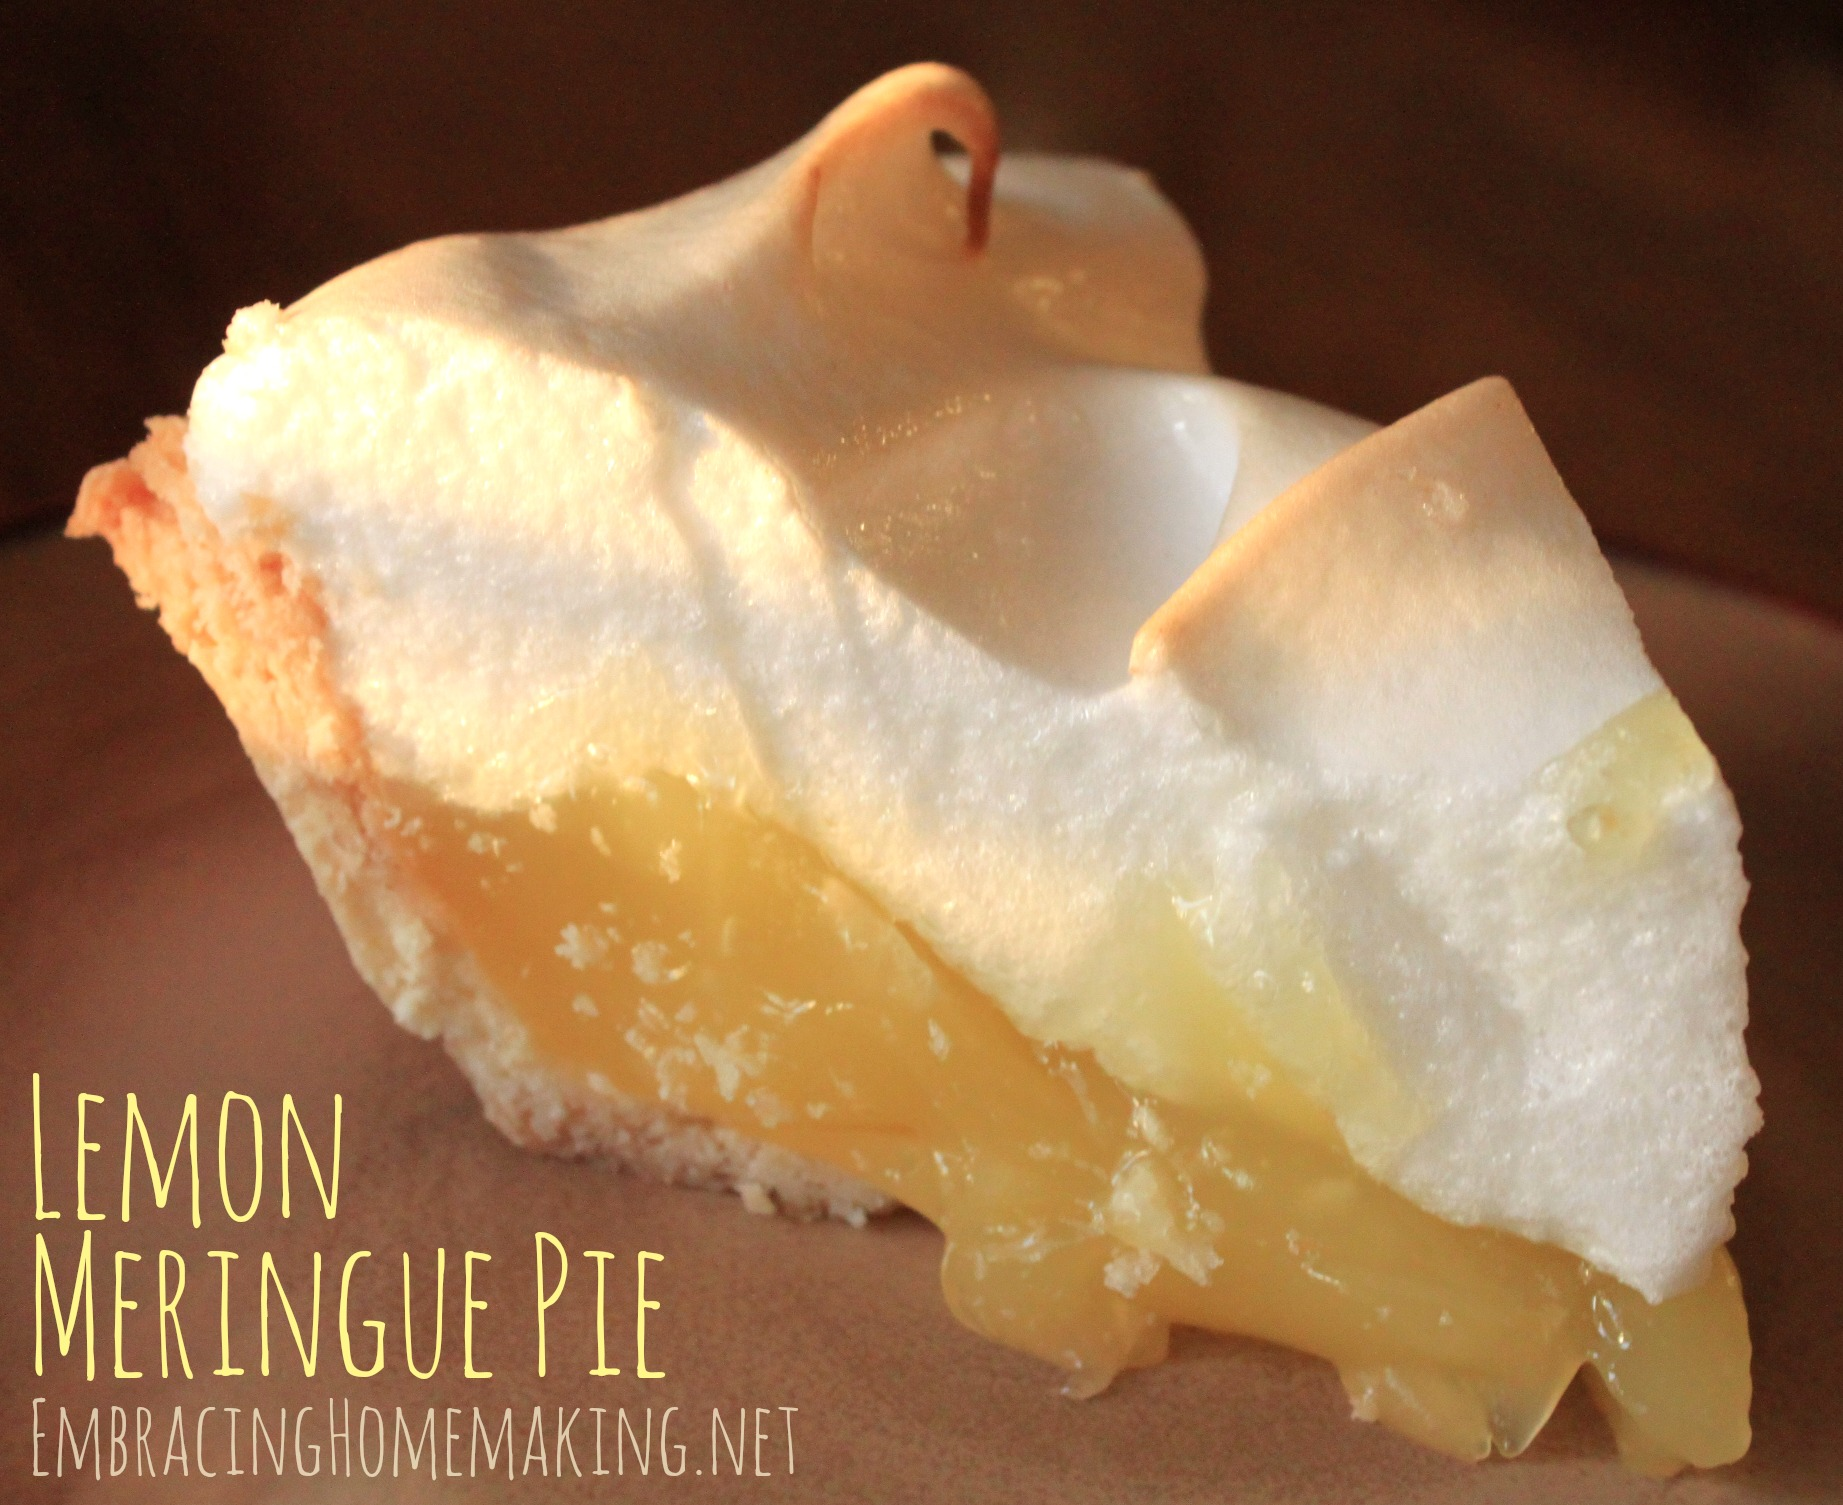 lemon meringue pie recipe this pie is bursting with fresh lemon ...